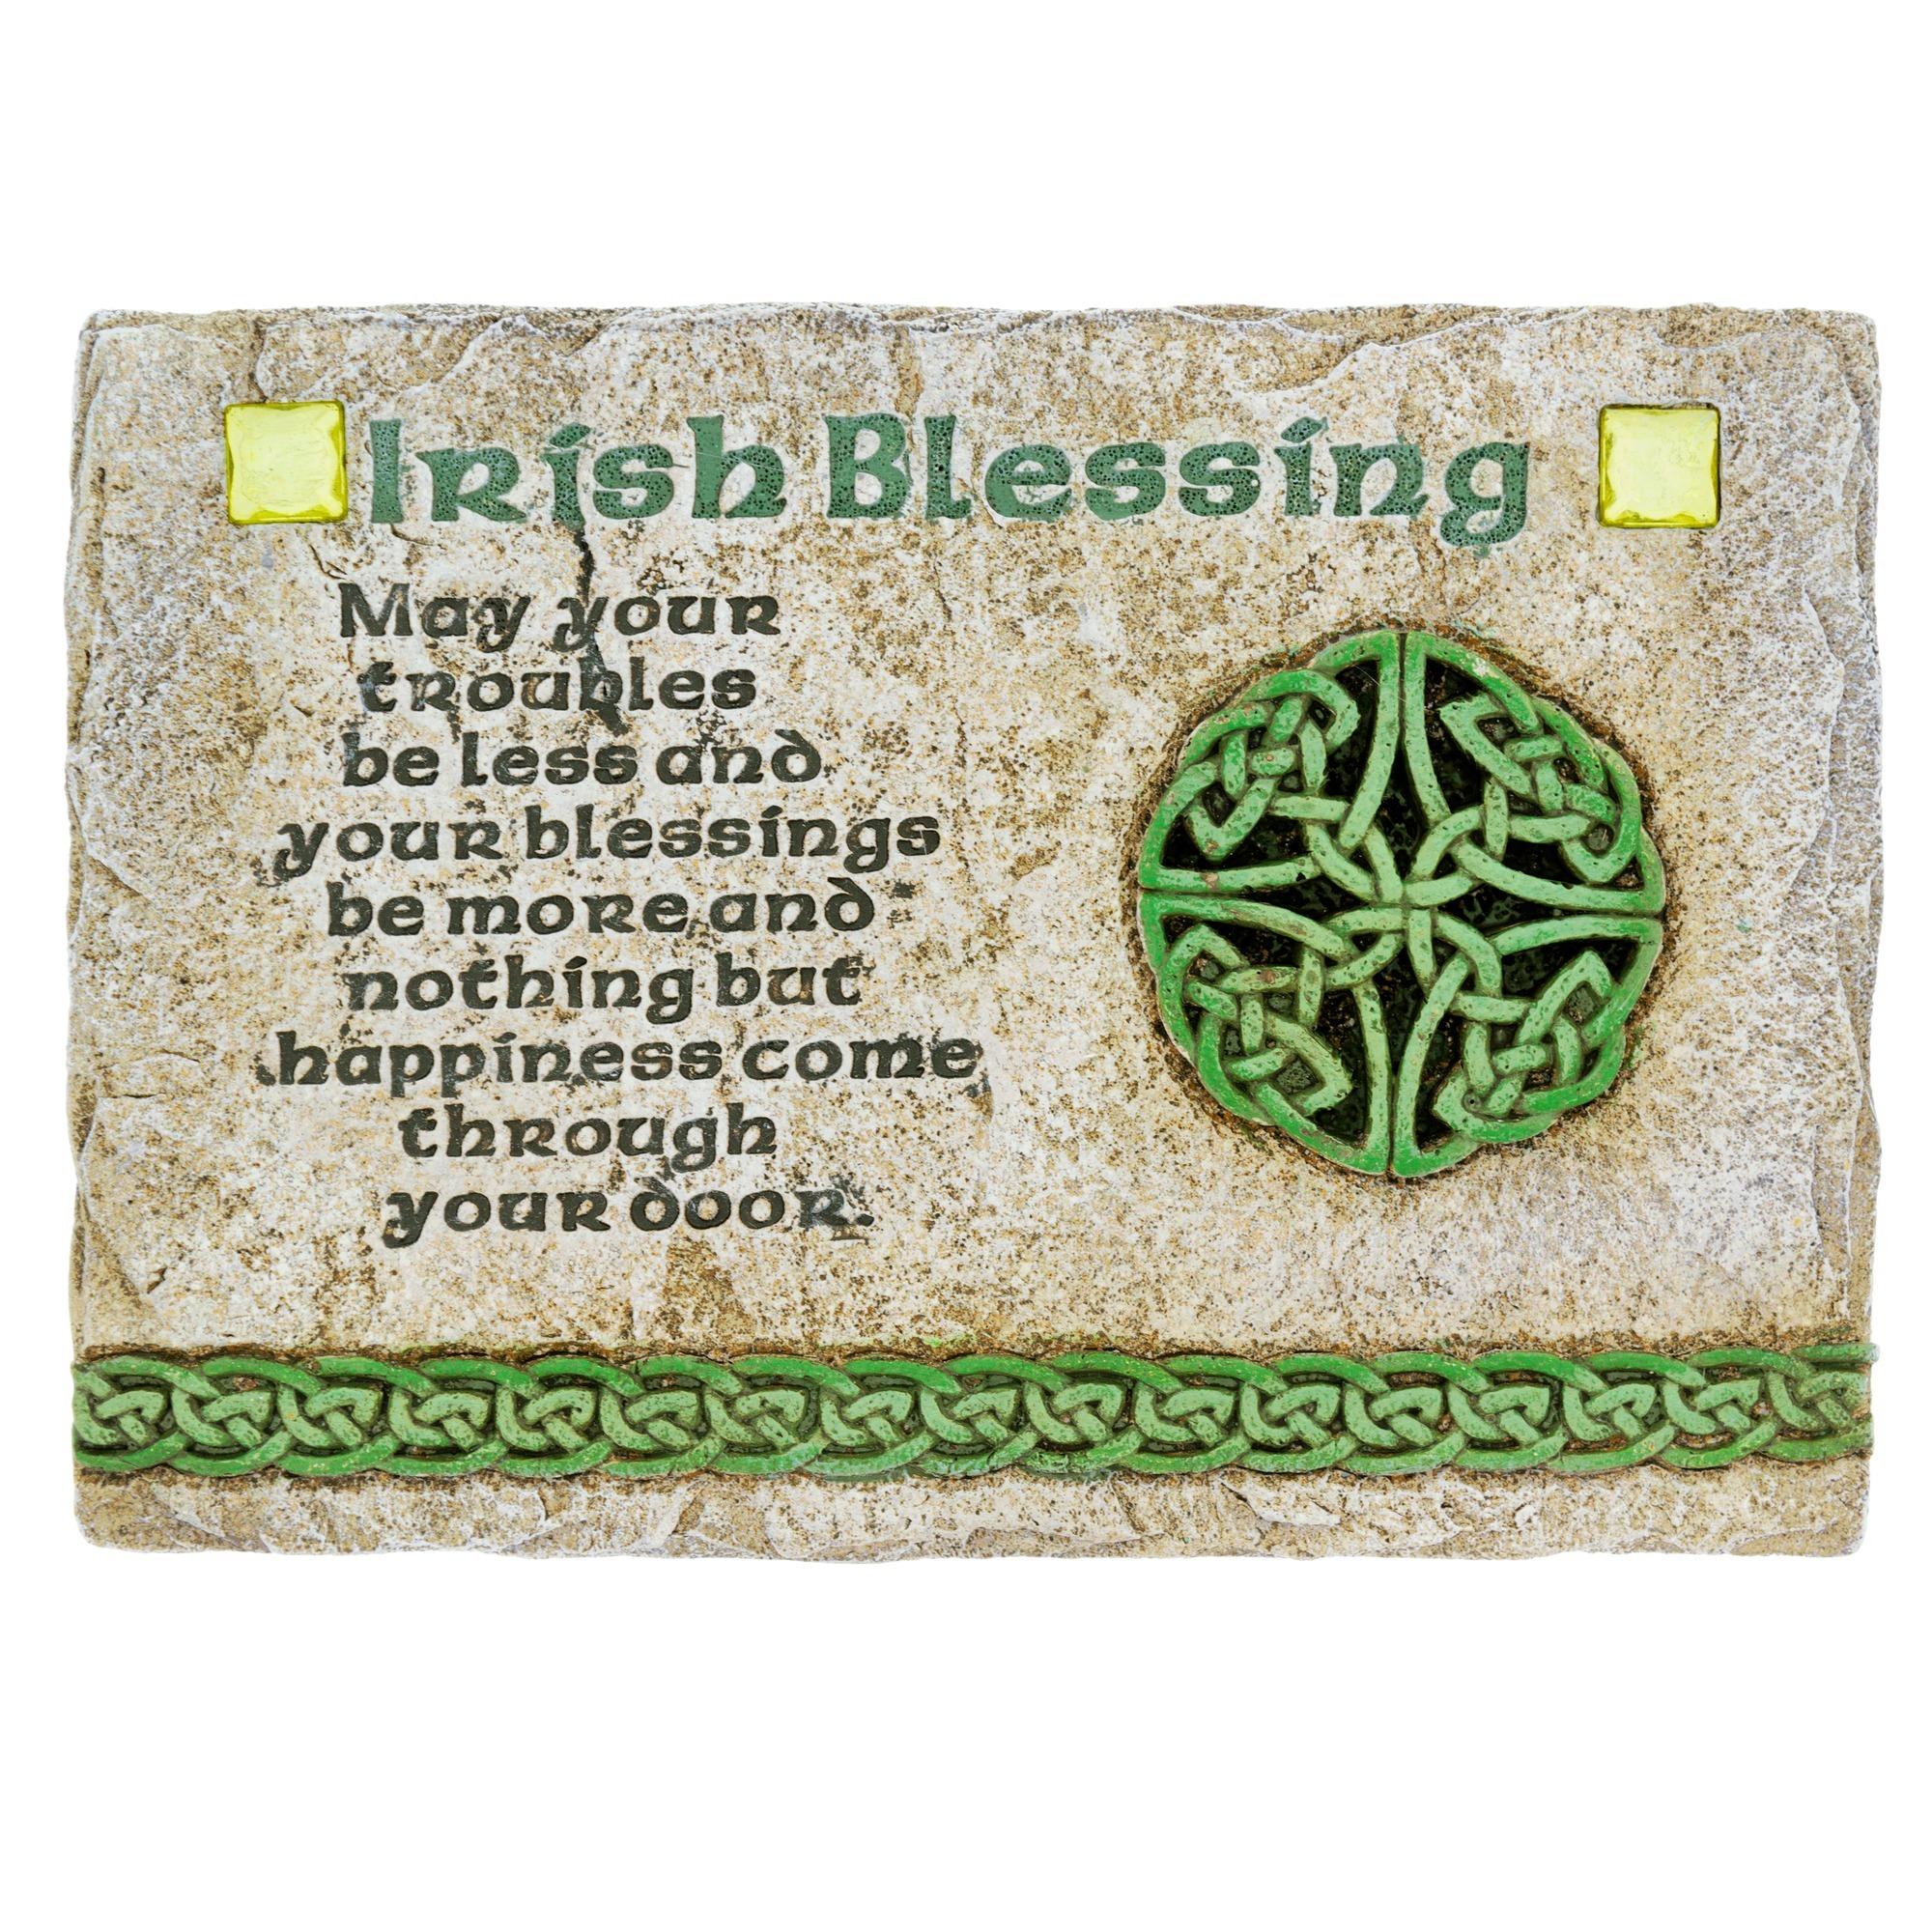 Irish Blessing Wall Plaque | The Catholic Company